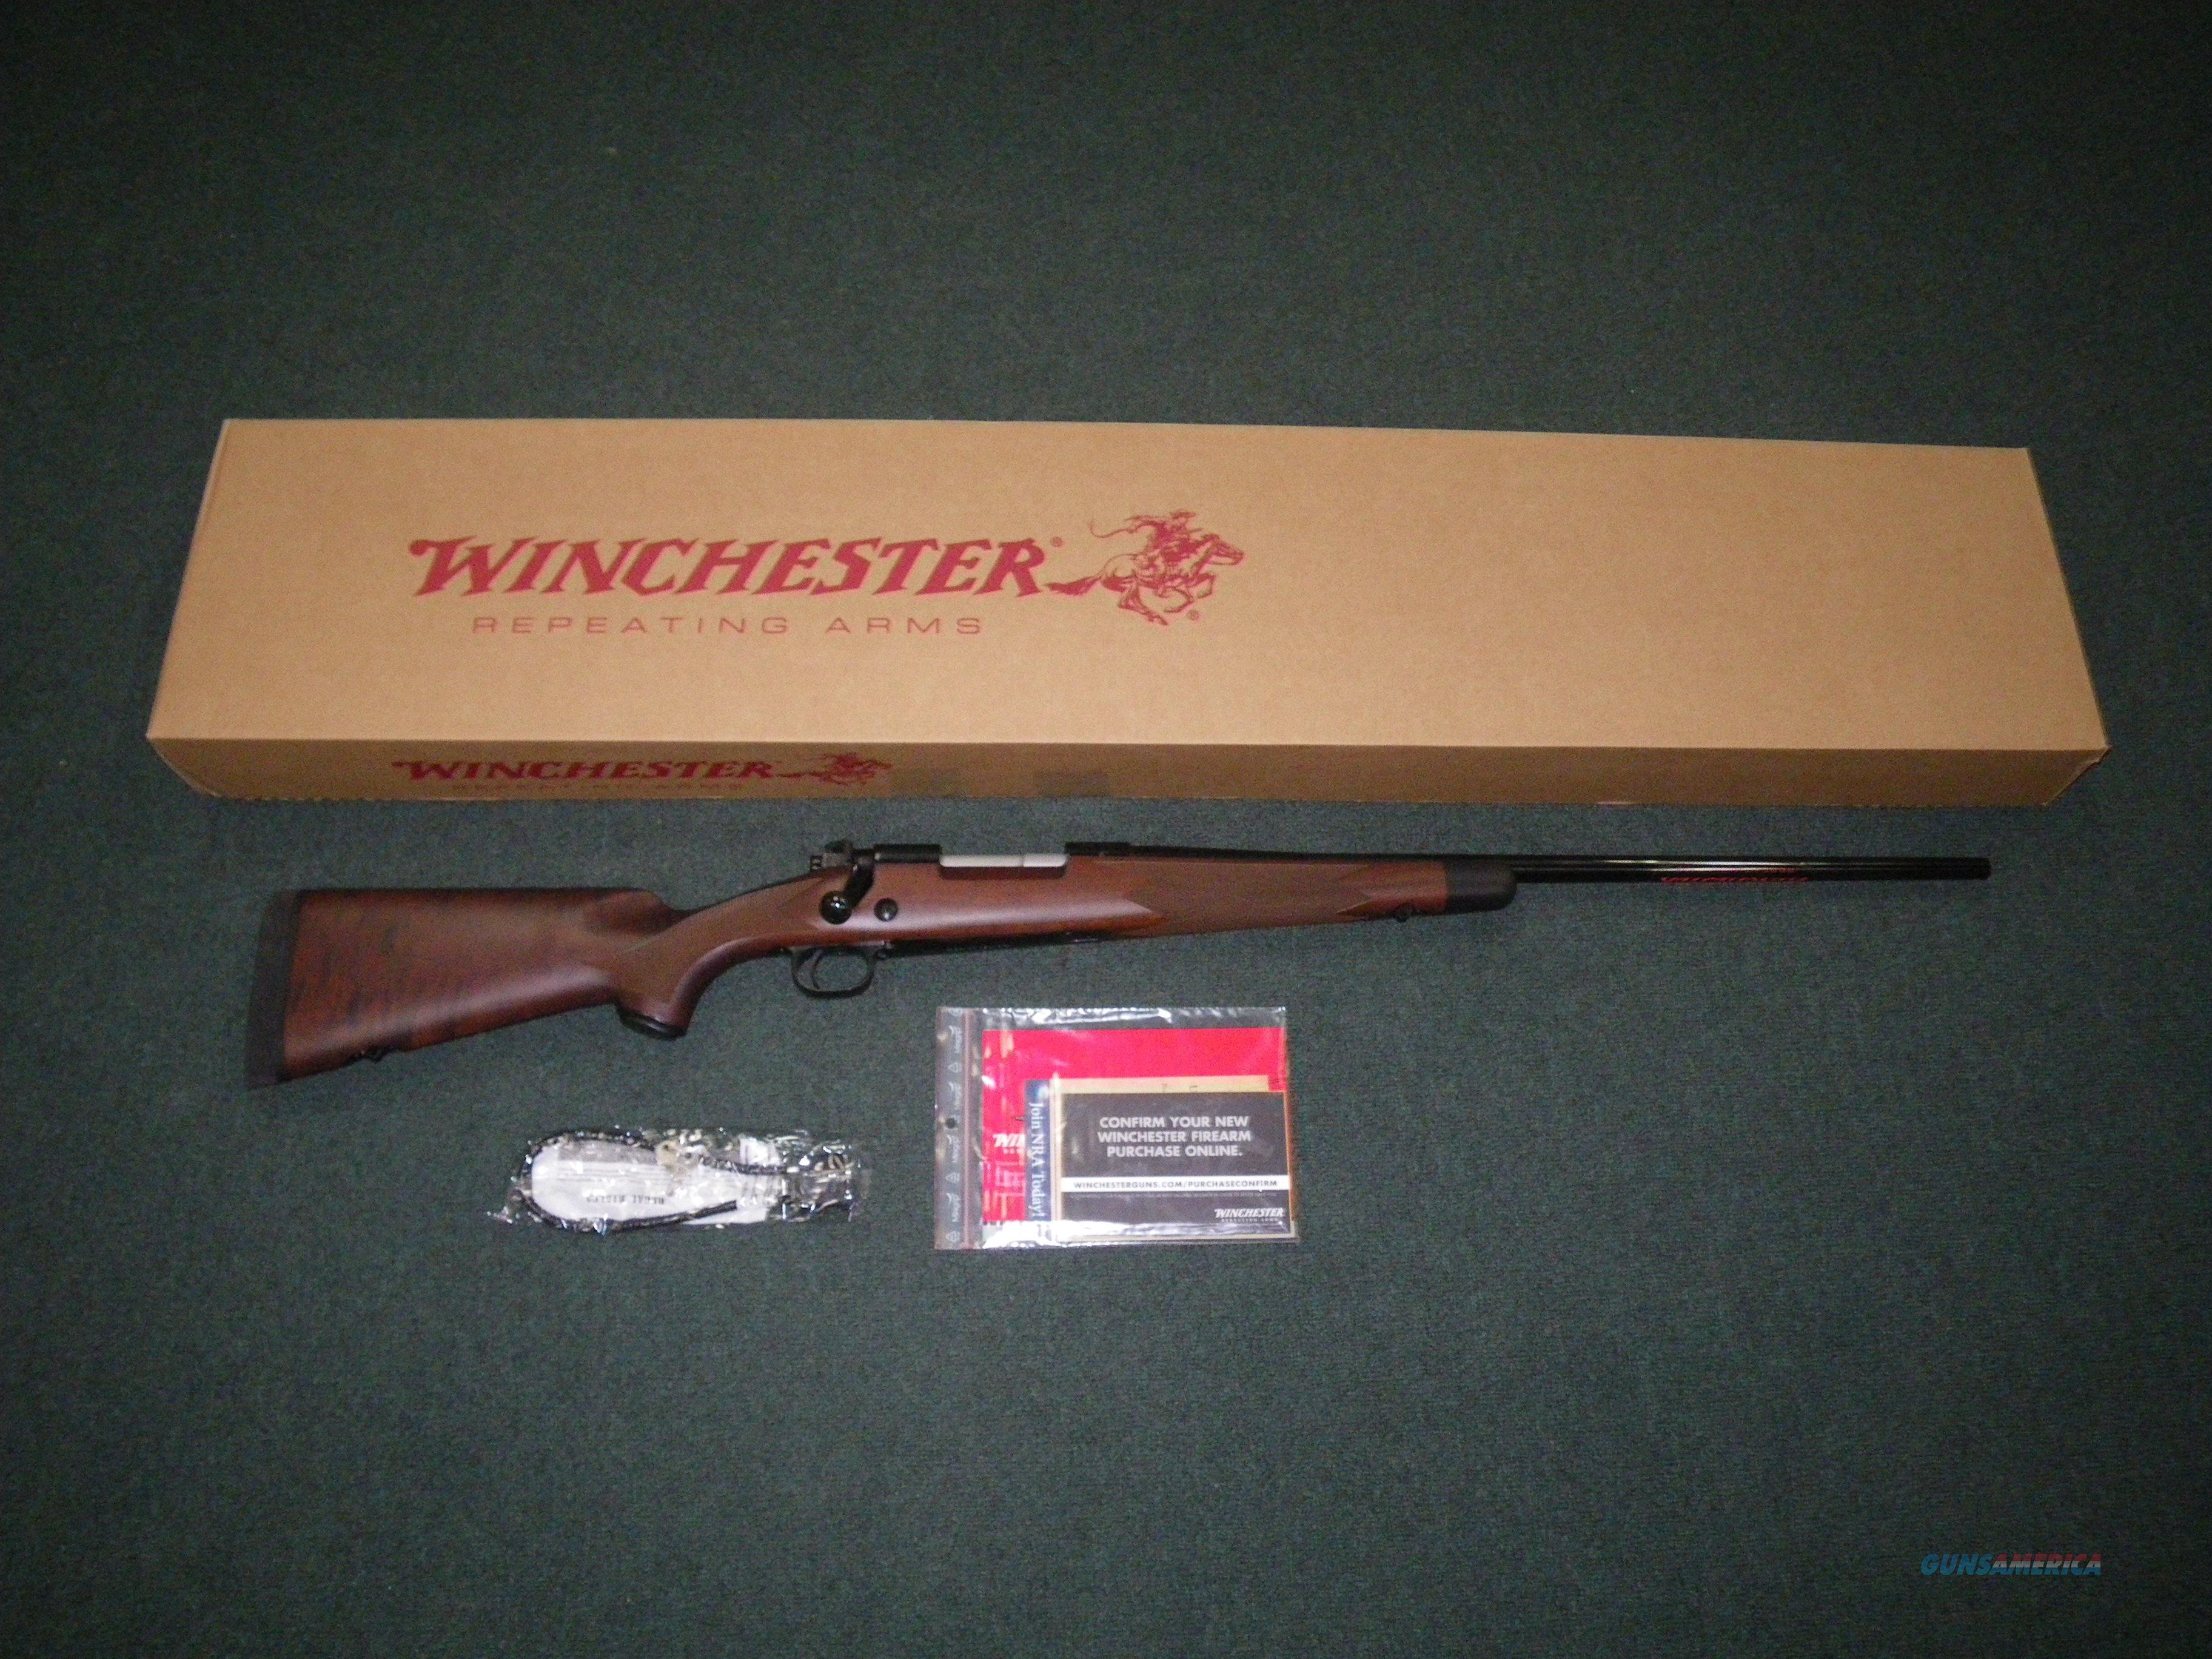 "Winchester Model 70 Super Grade 270 Win 24"" NEW #535203226  Guns > Rifles > Winchester Rifles - Modern Bolt/Auto/Single > Model 70 > Post-64"